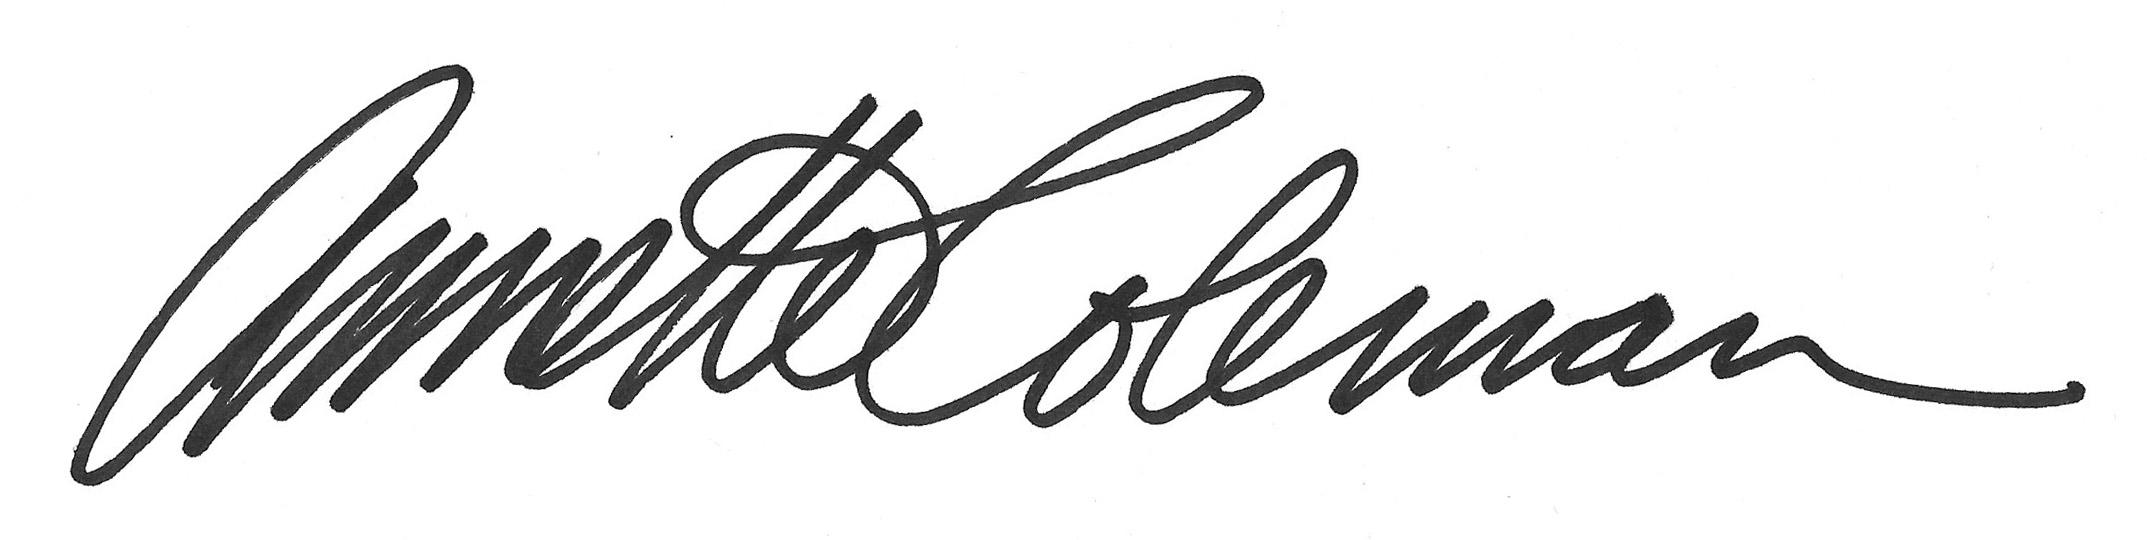 Annette Coleman's Signature